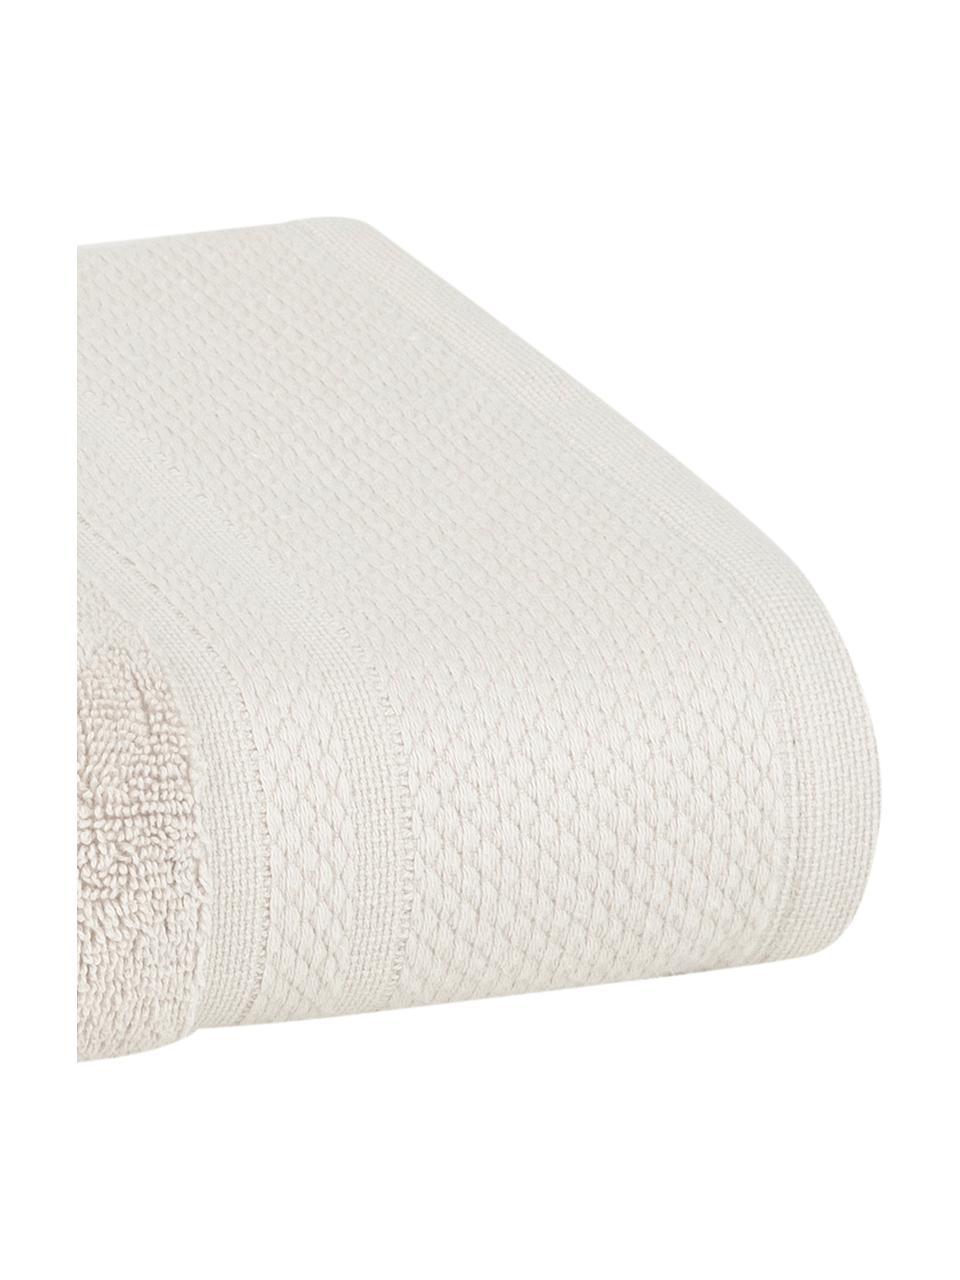 Asciugamano con bordo decorativo classico Premium, Beige, Asciugamano